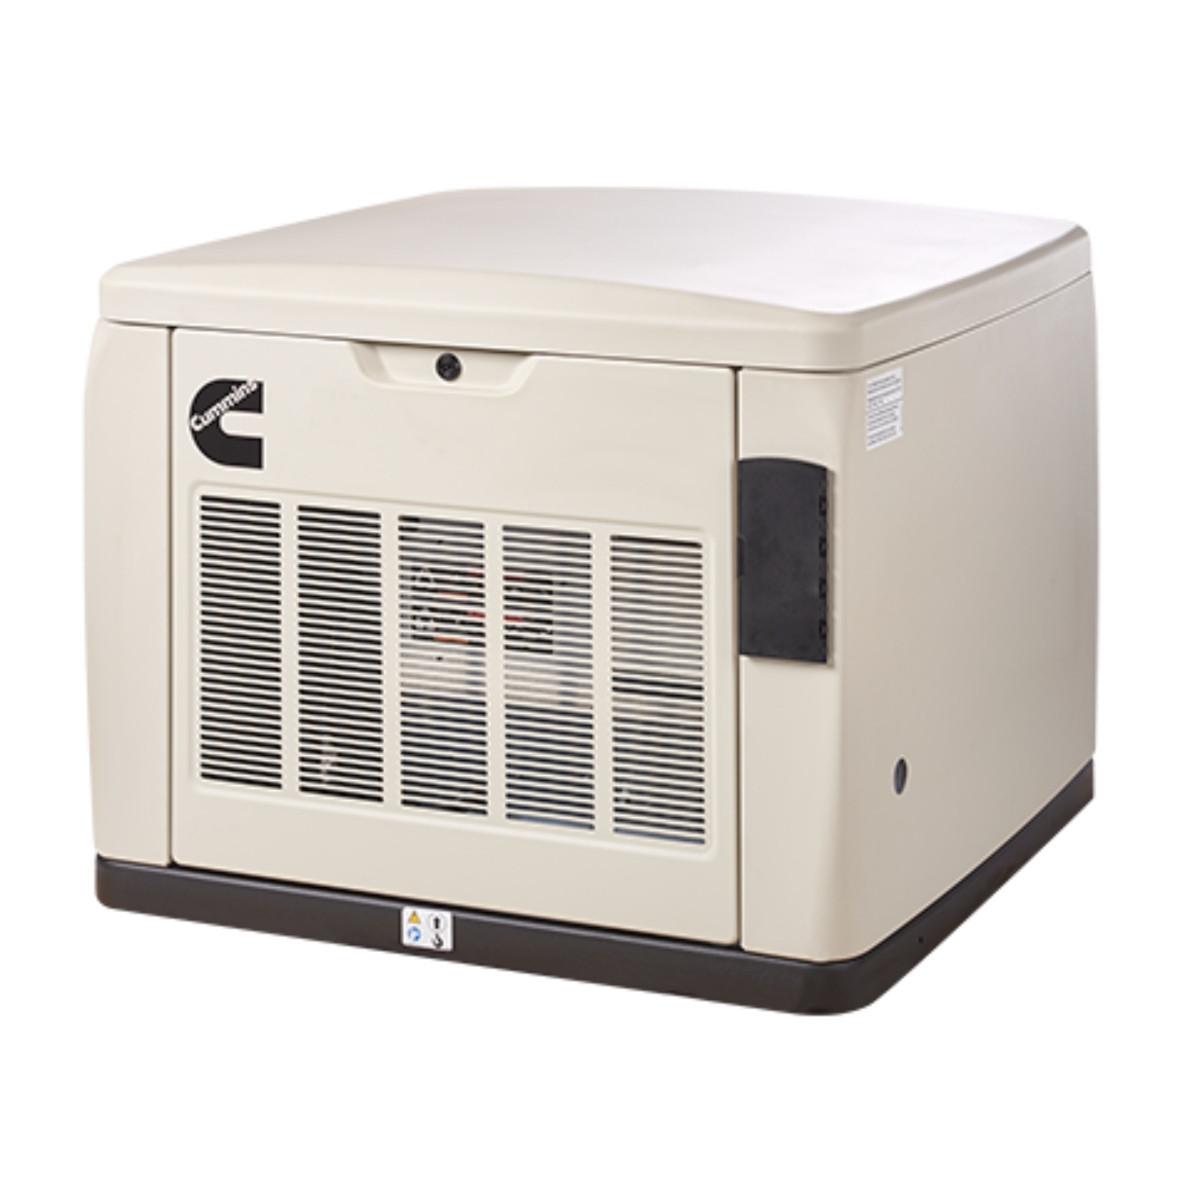 cummins rs17a 17kw quiet connect series cummins power generation generator [ 1200 x 1200 Pixel ]